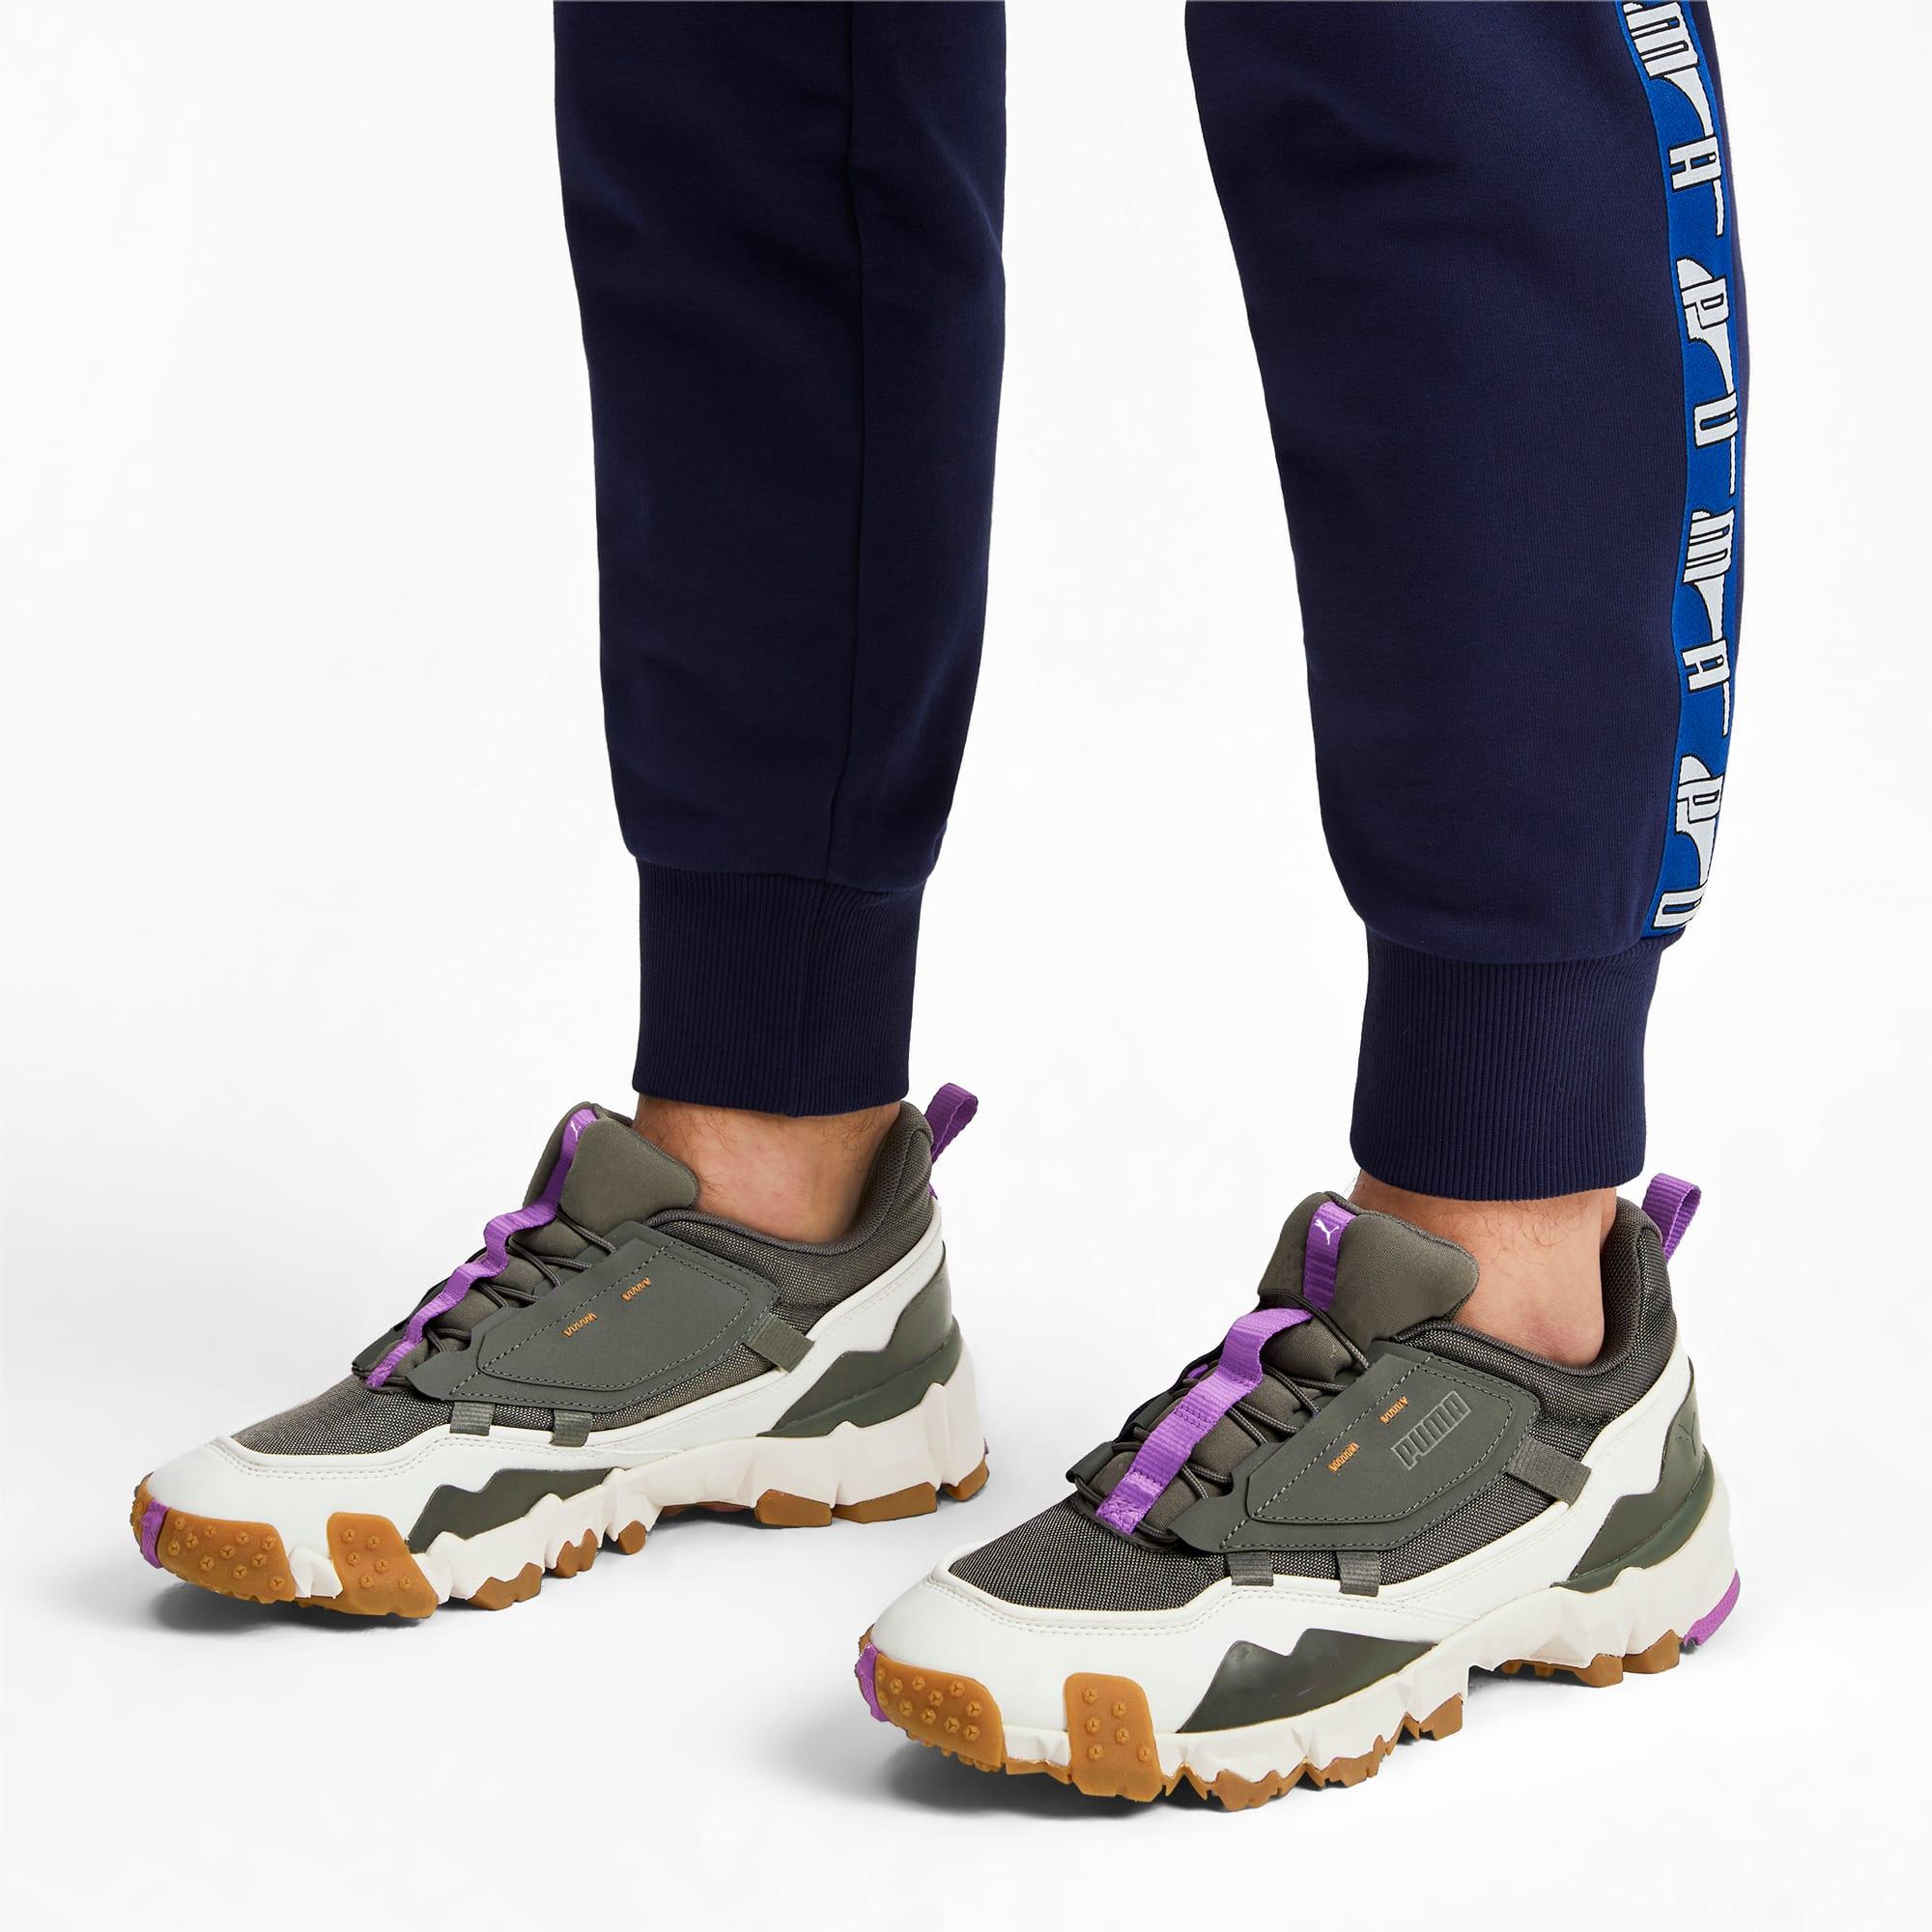 Trailfox Overland MTS Running Shoes